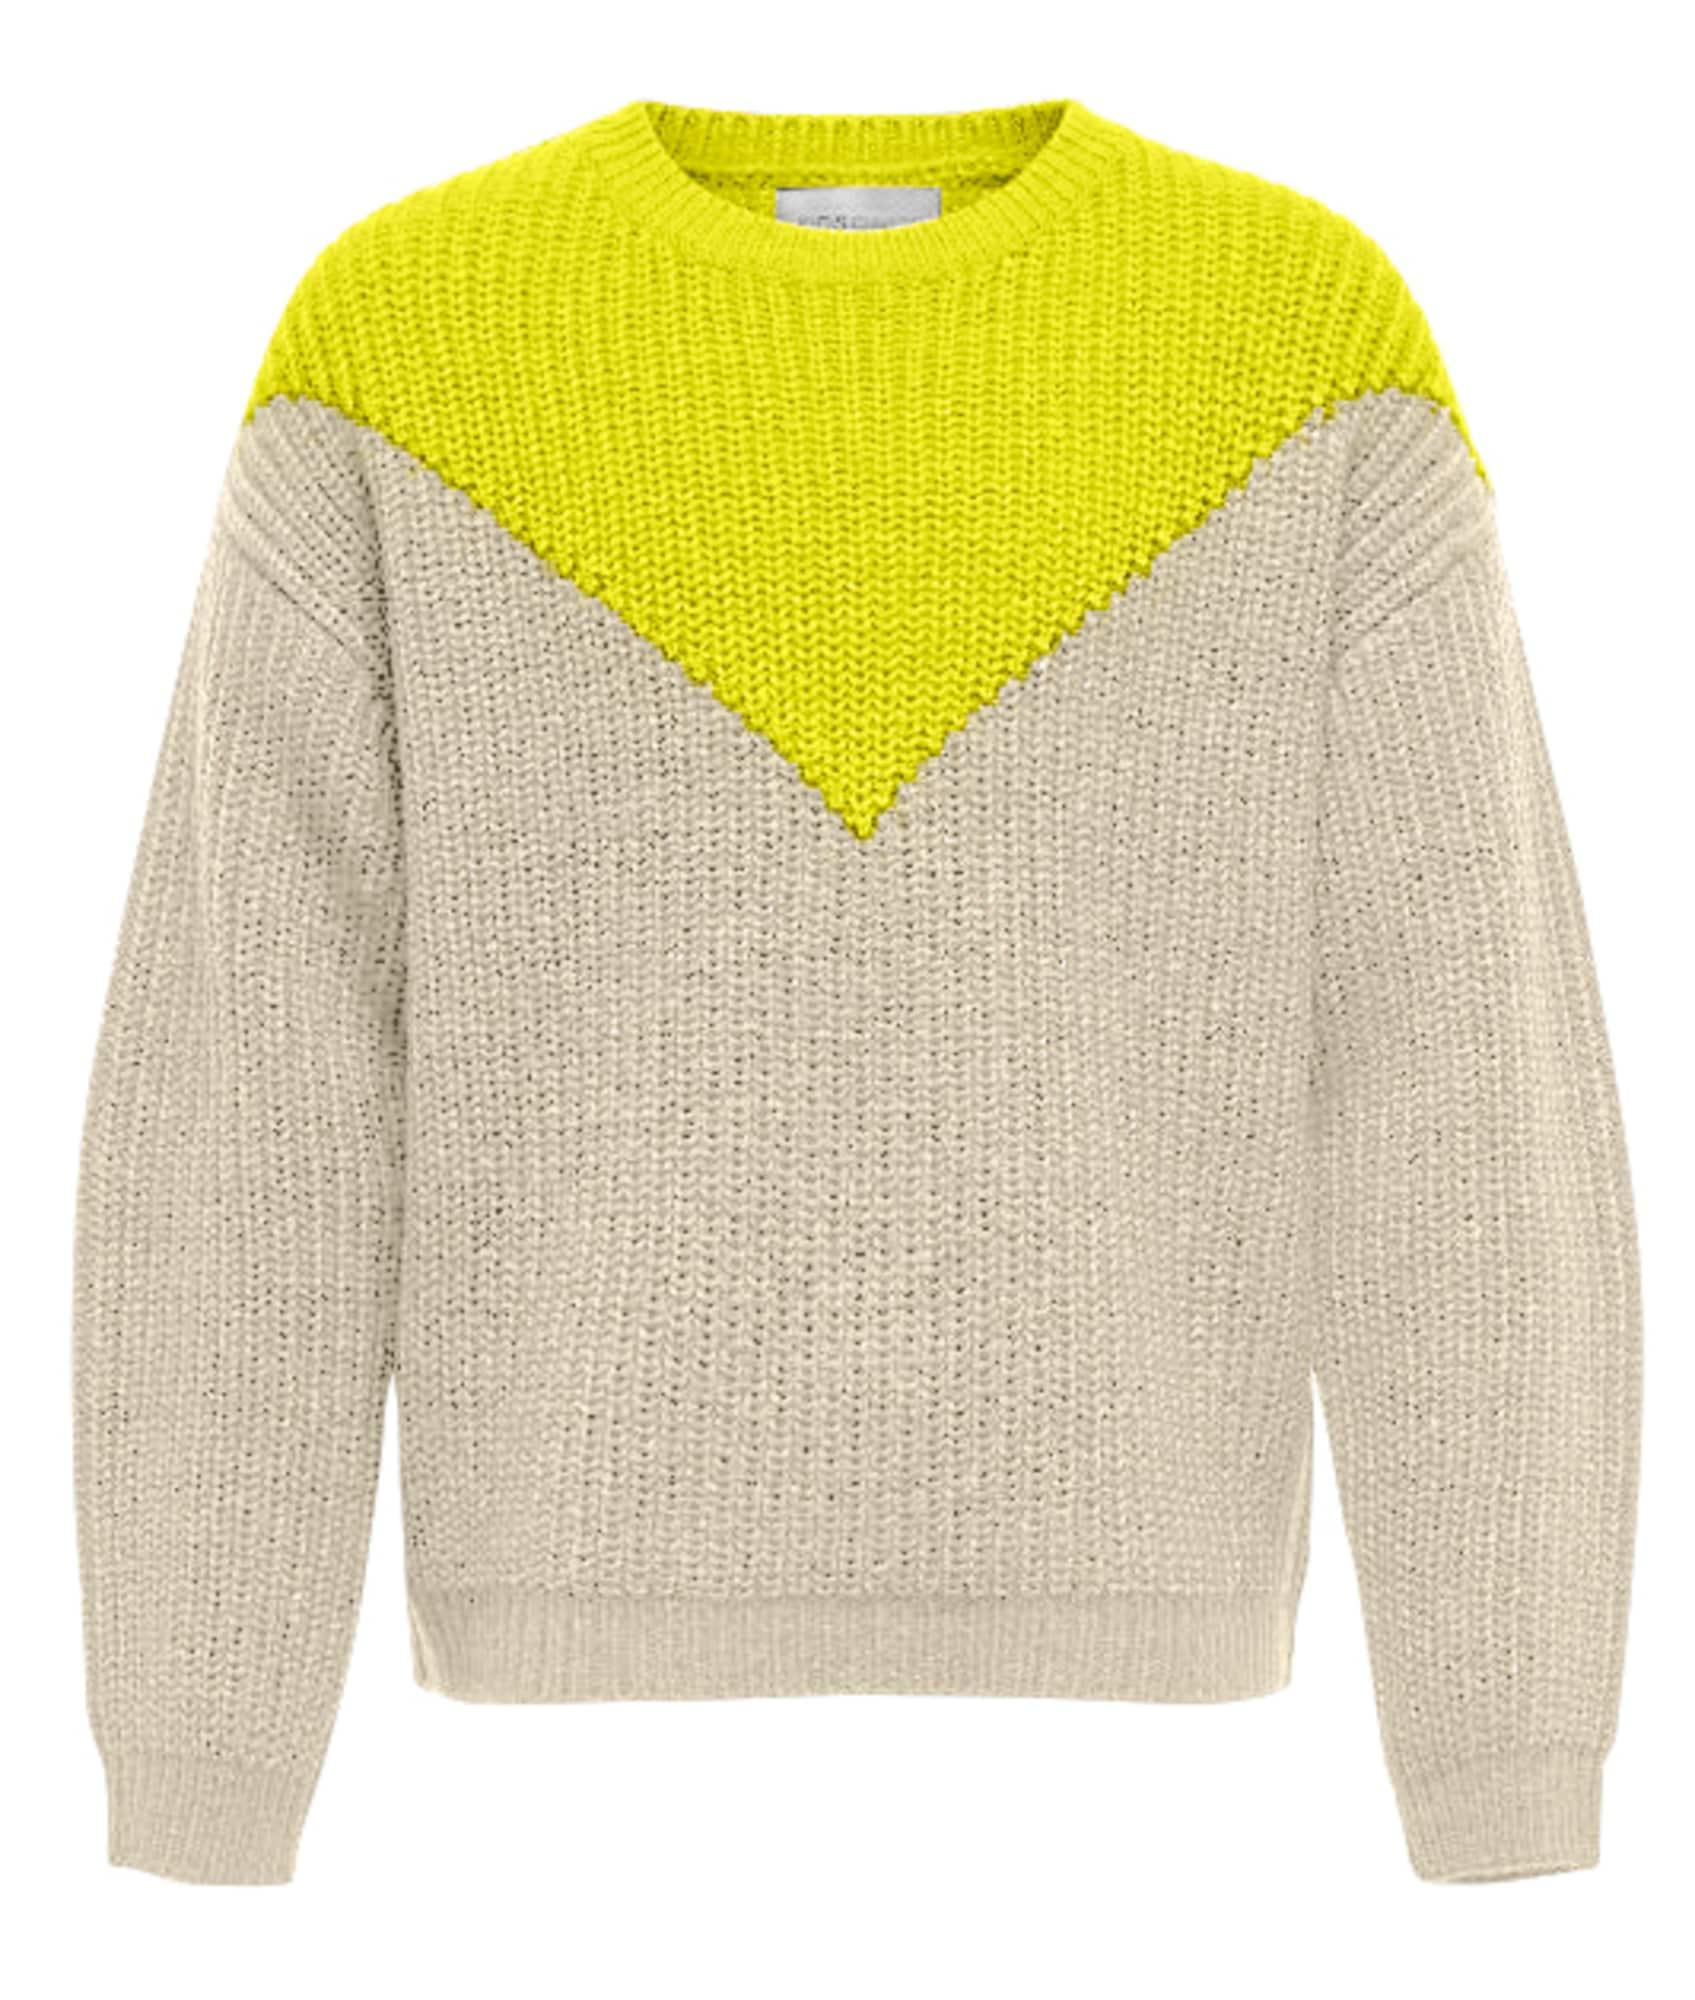 KIDS ONLY Megztinis geltona / pilka